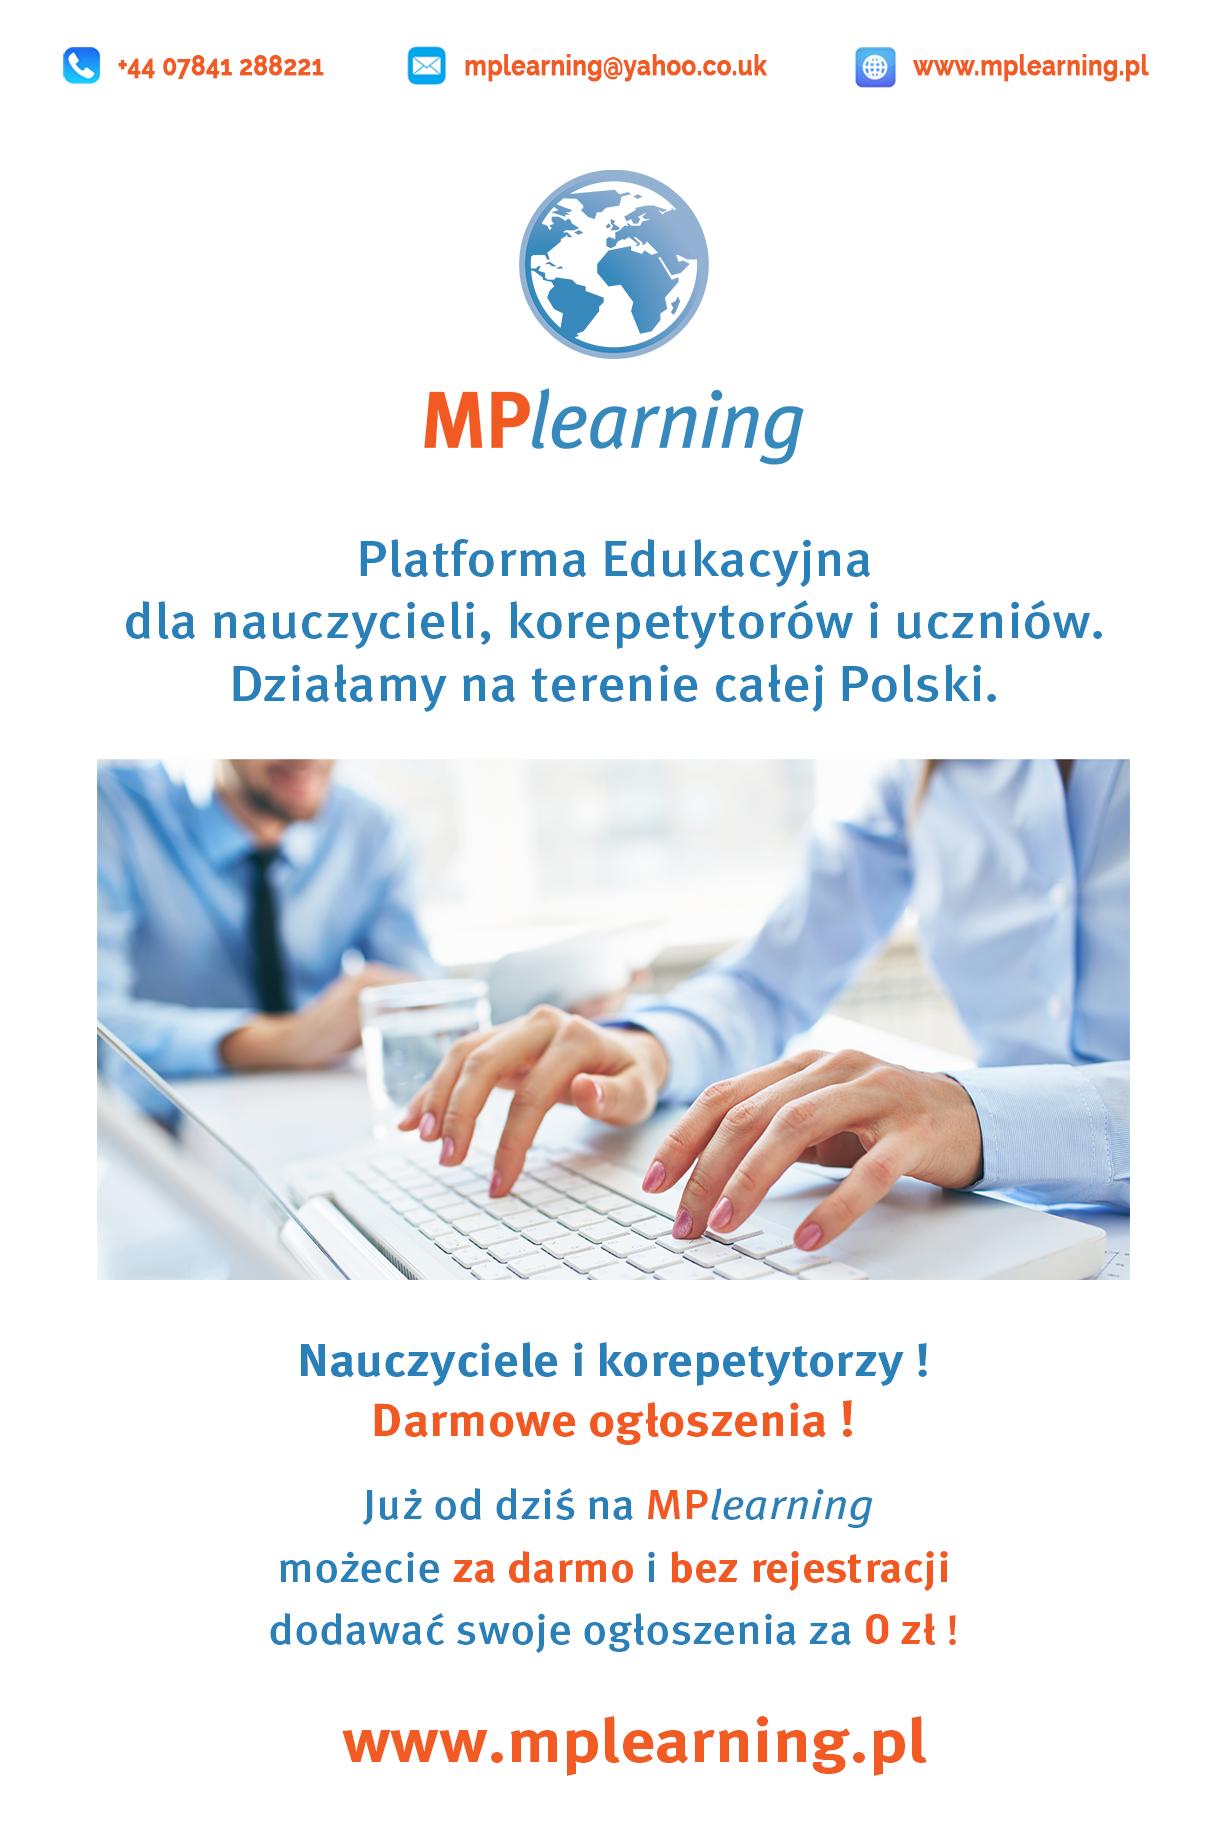 darmowe_ogloszenia_mplearning_plakat5